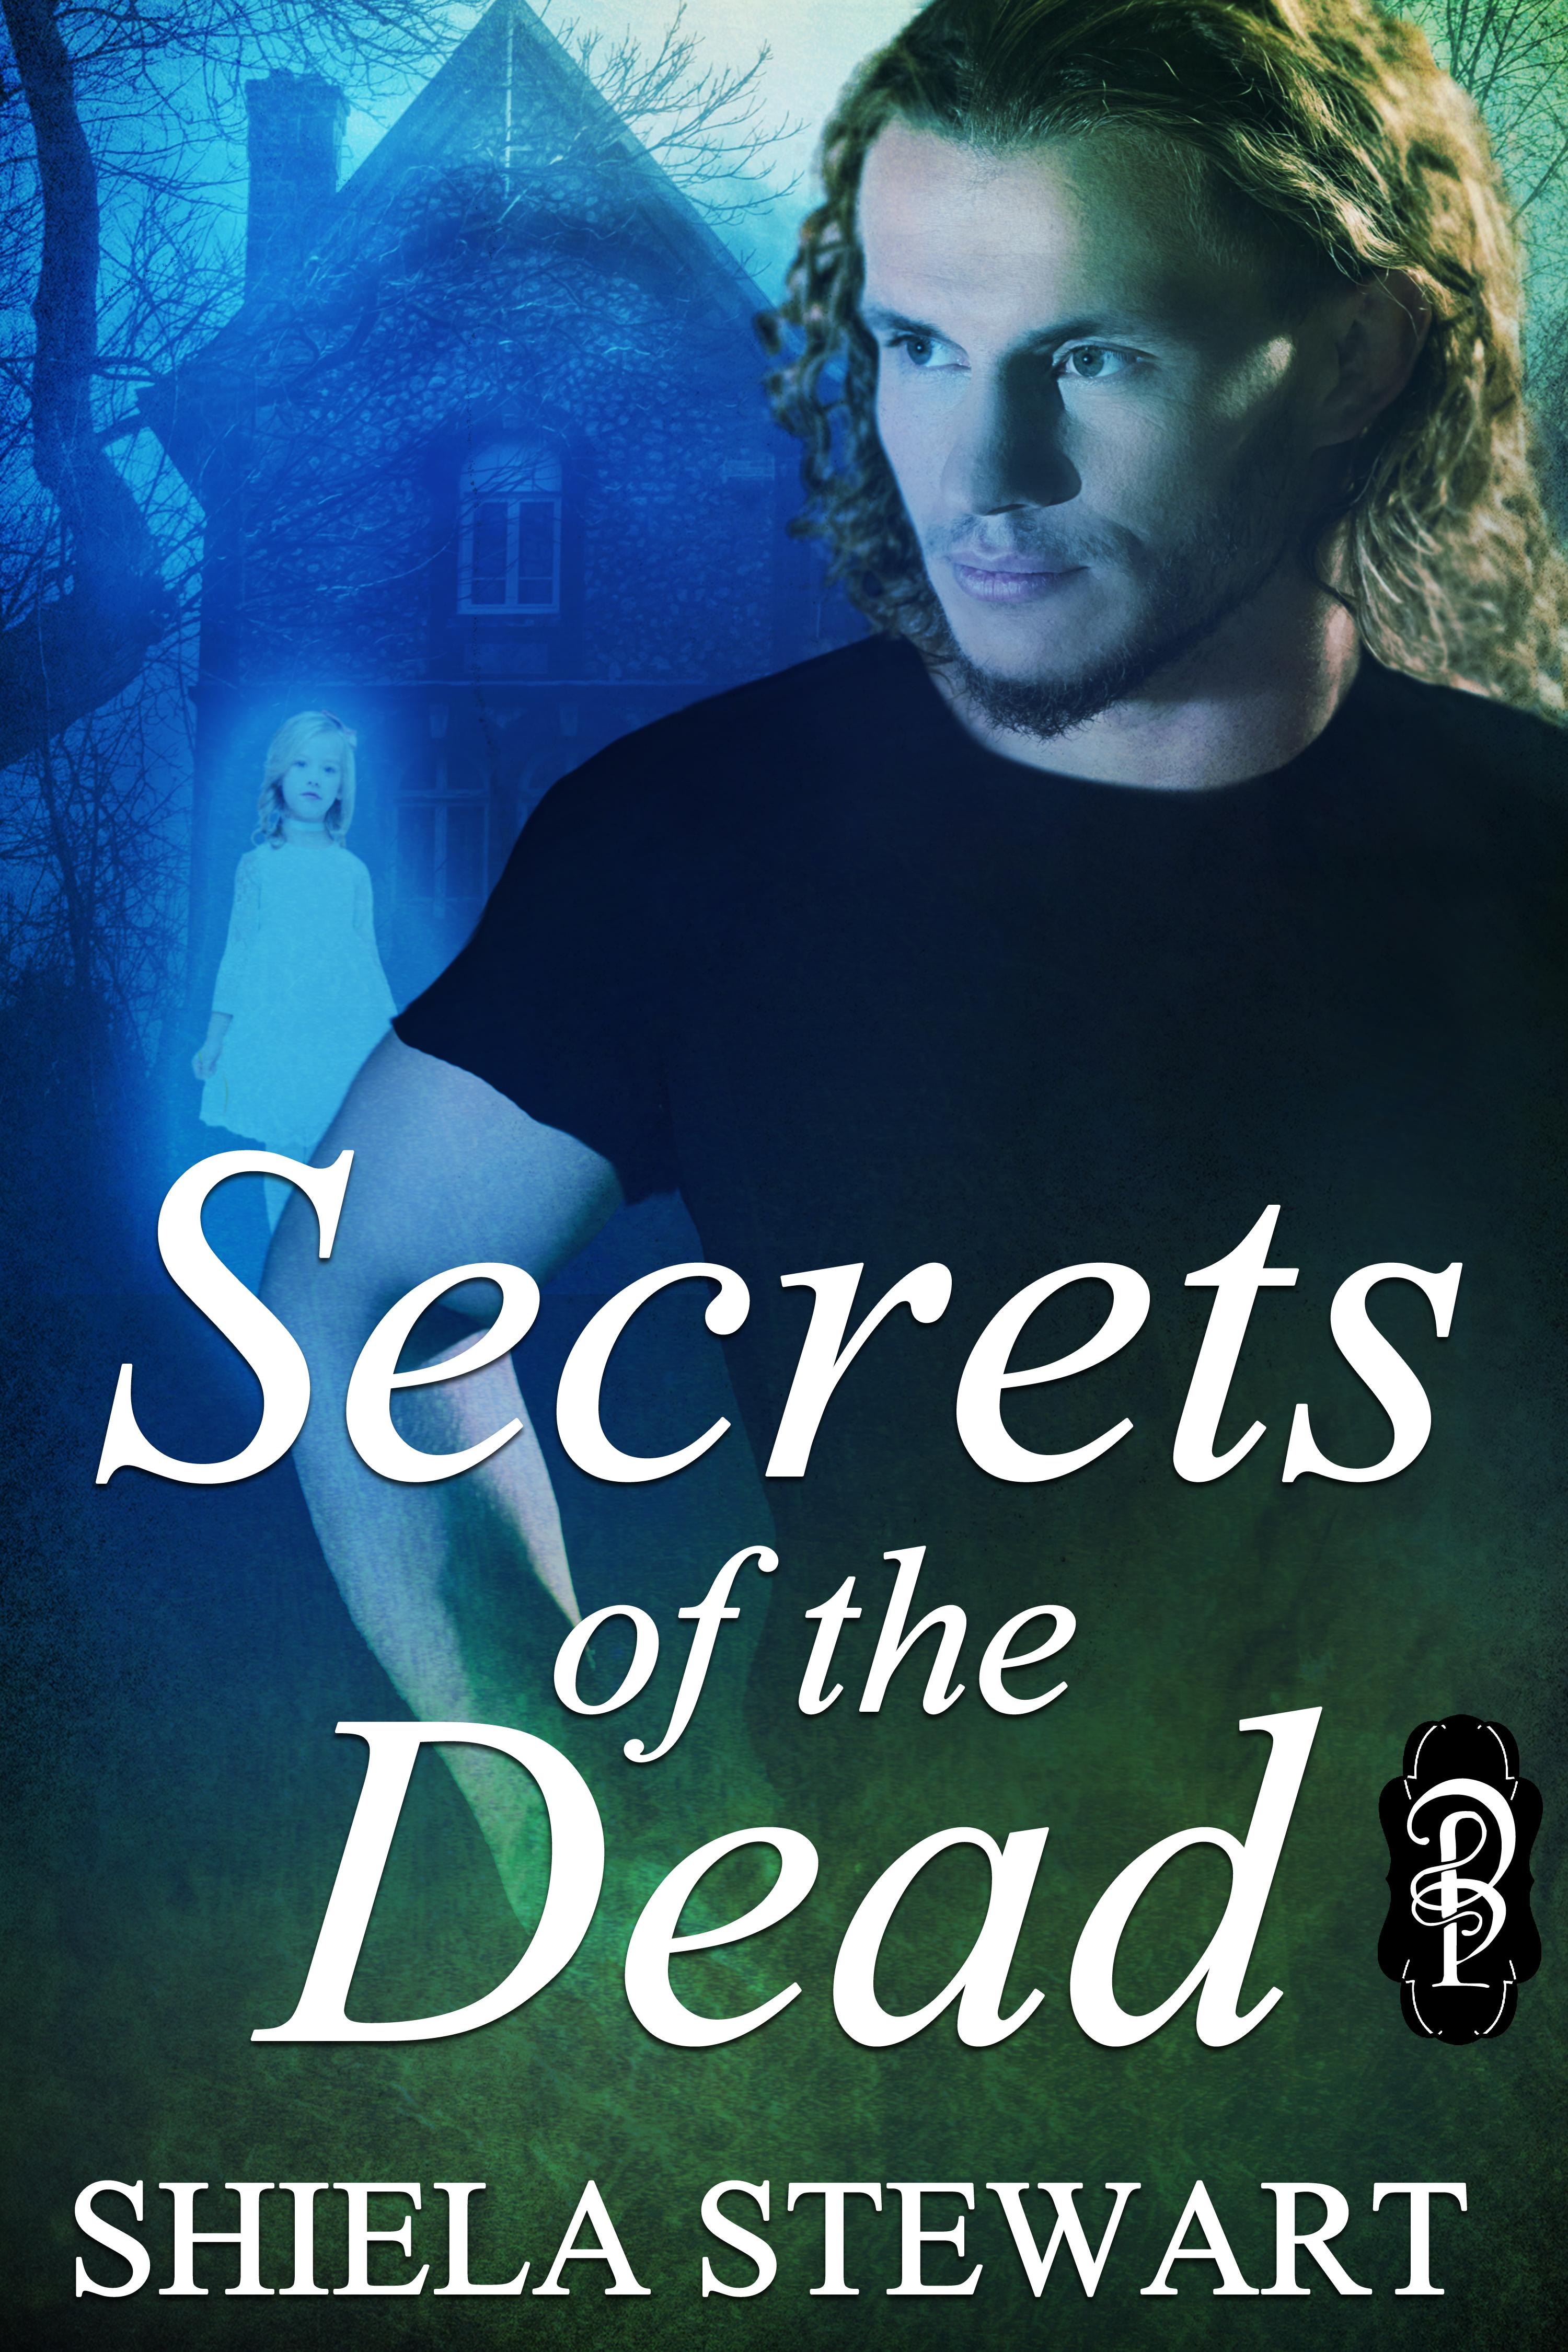 Secrets of the Dead Amazon New